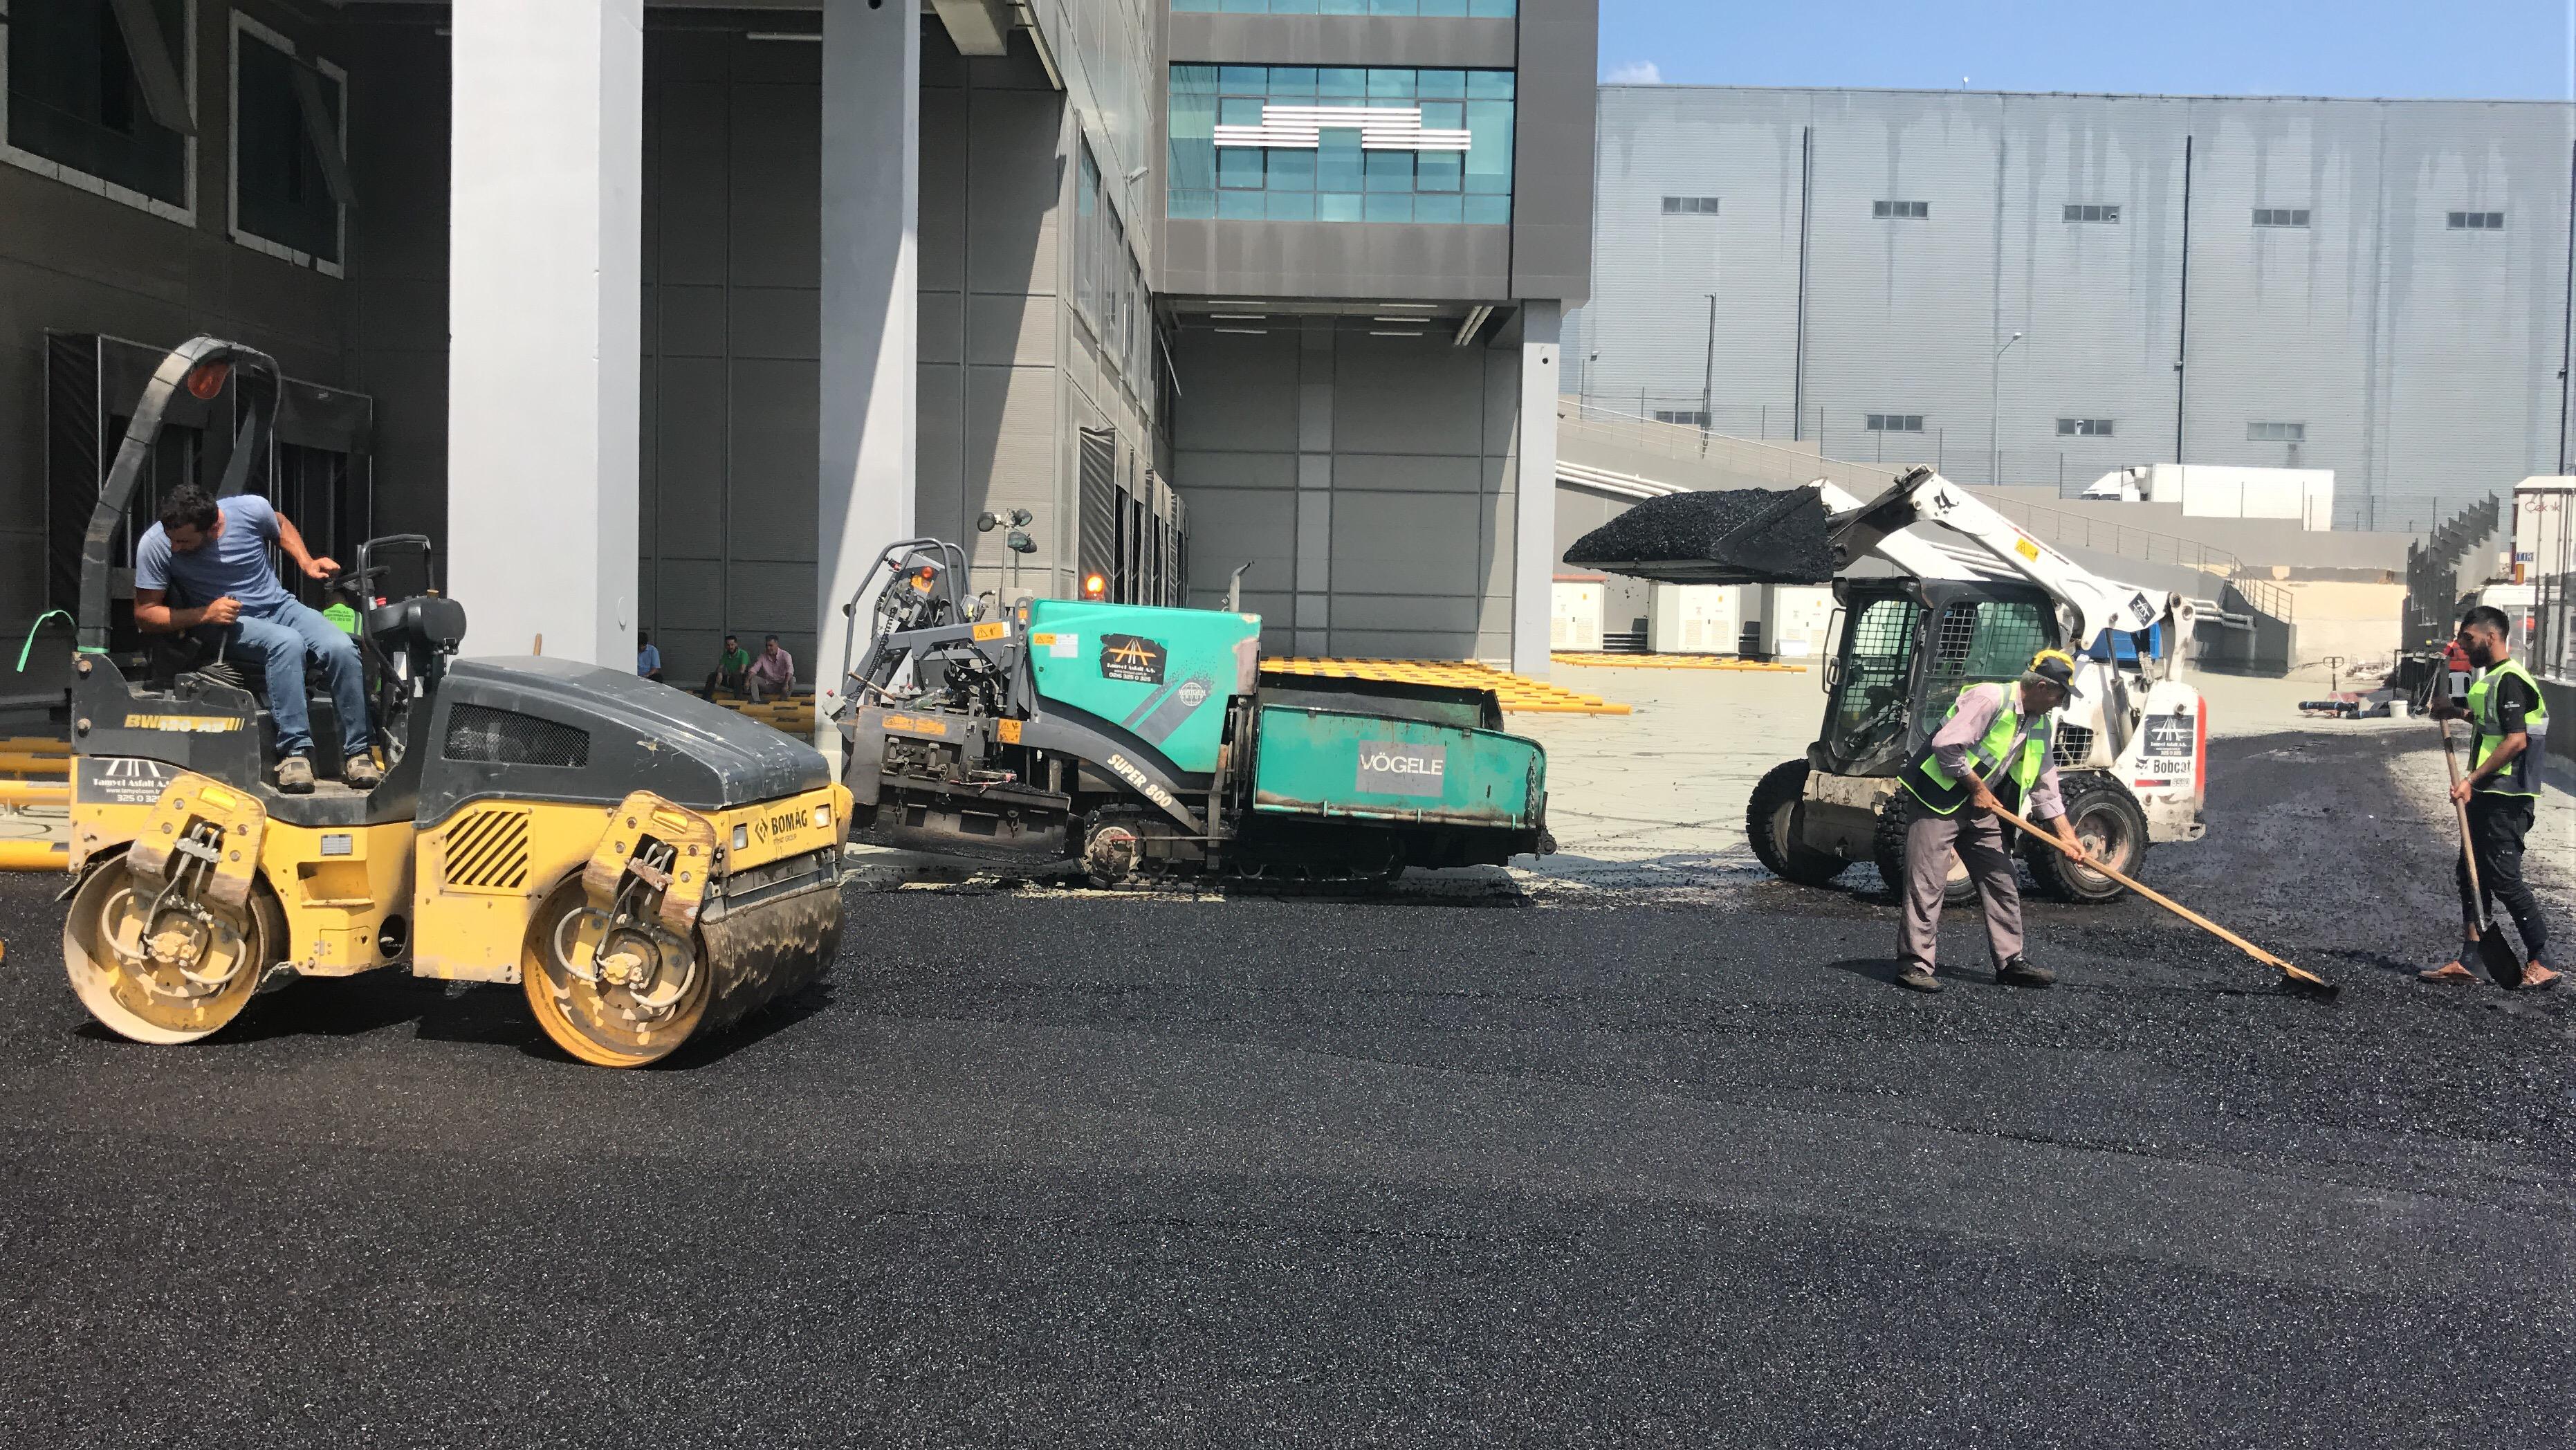 açık otopark asfalt